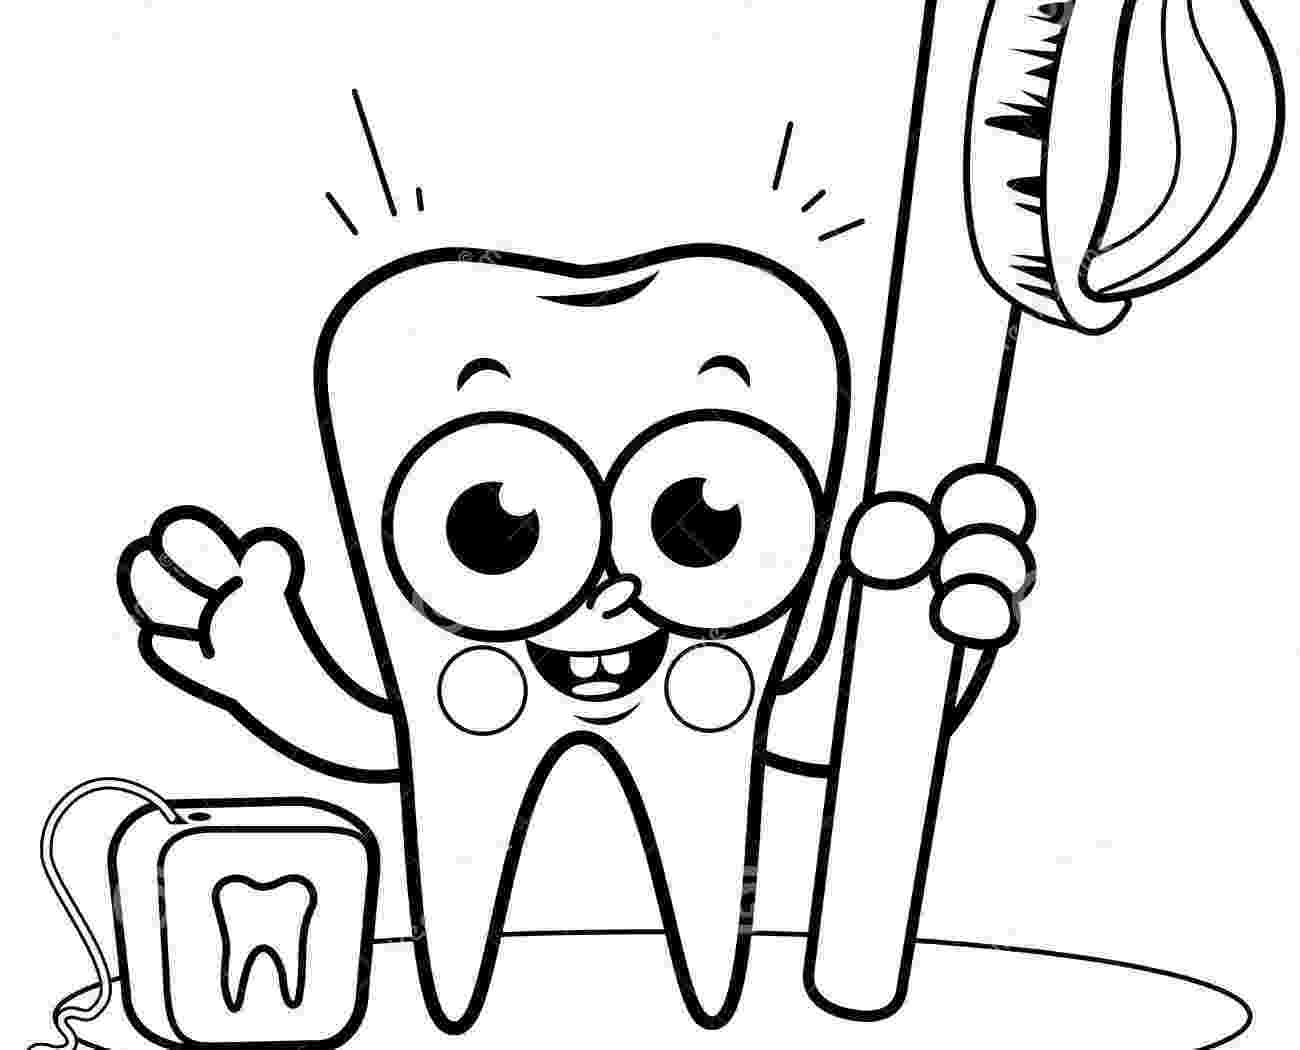 toothbrush coloring page toothbrush coloring pages getcoloringpagescom toothbrush page coloring